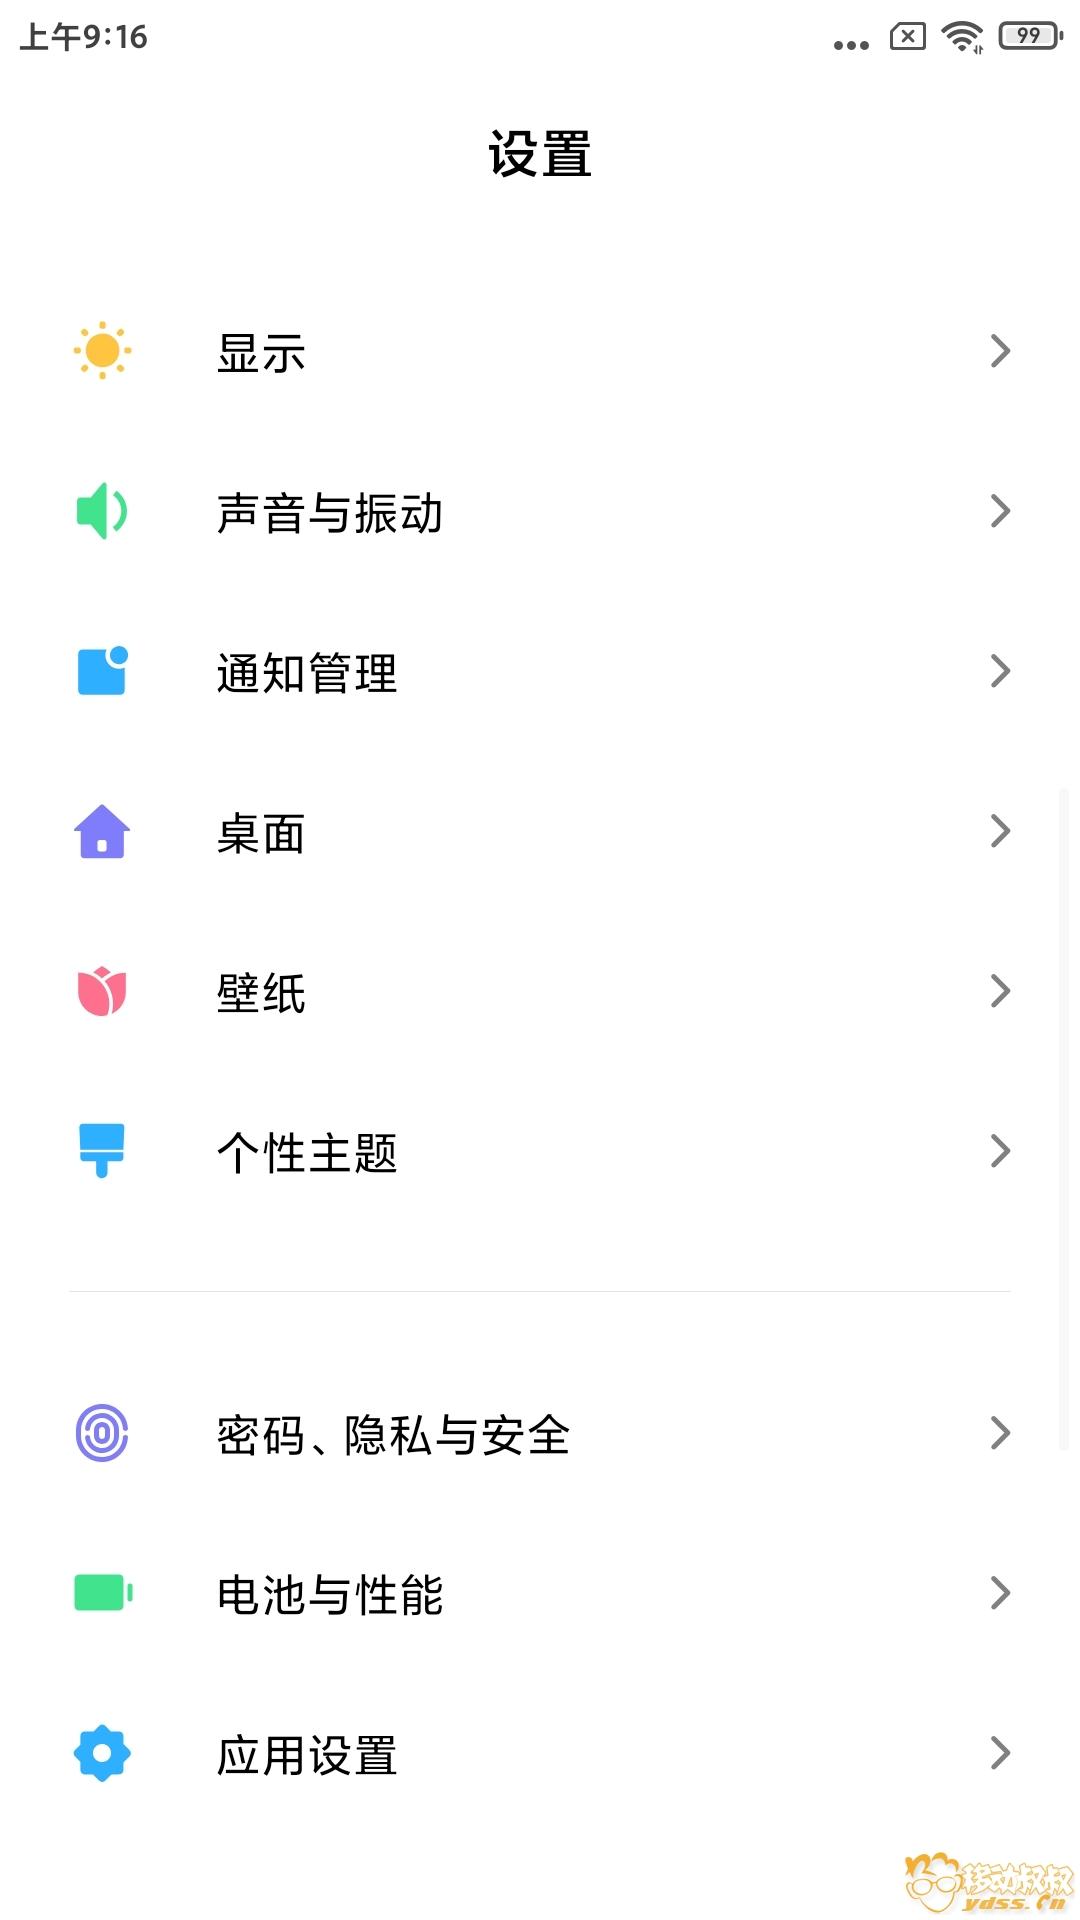 Screenshot_2020-04-04-09-16-52-669_com.android.settings.jpg